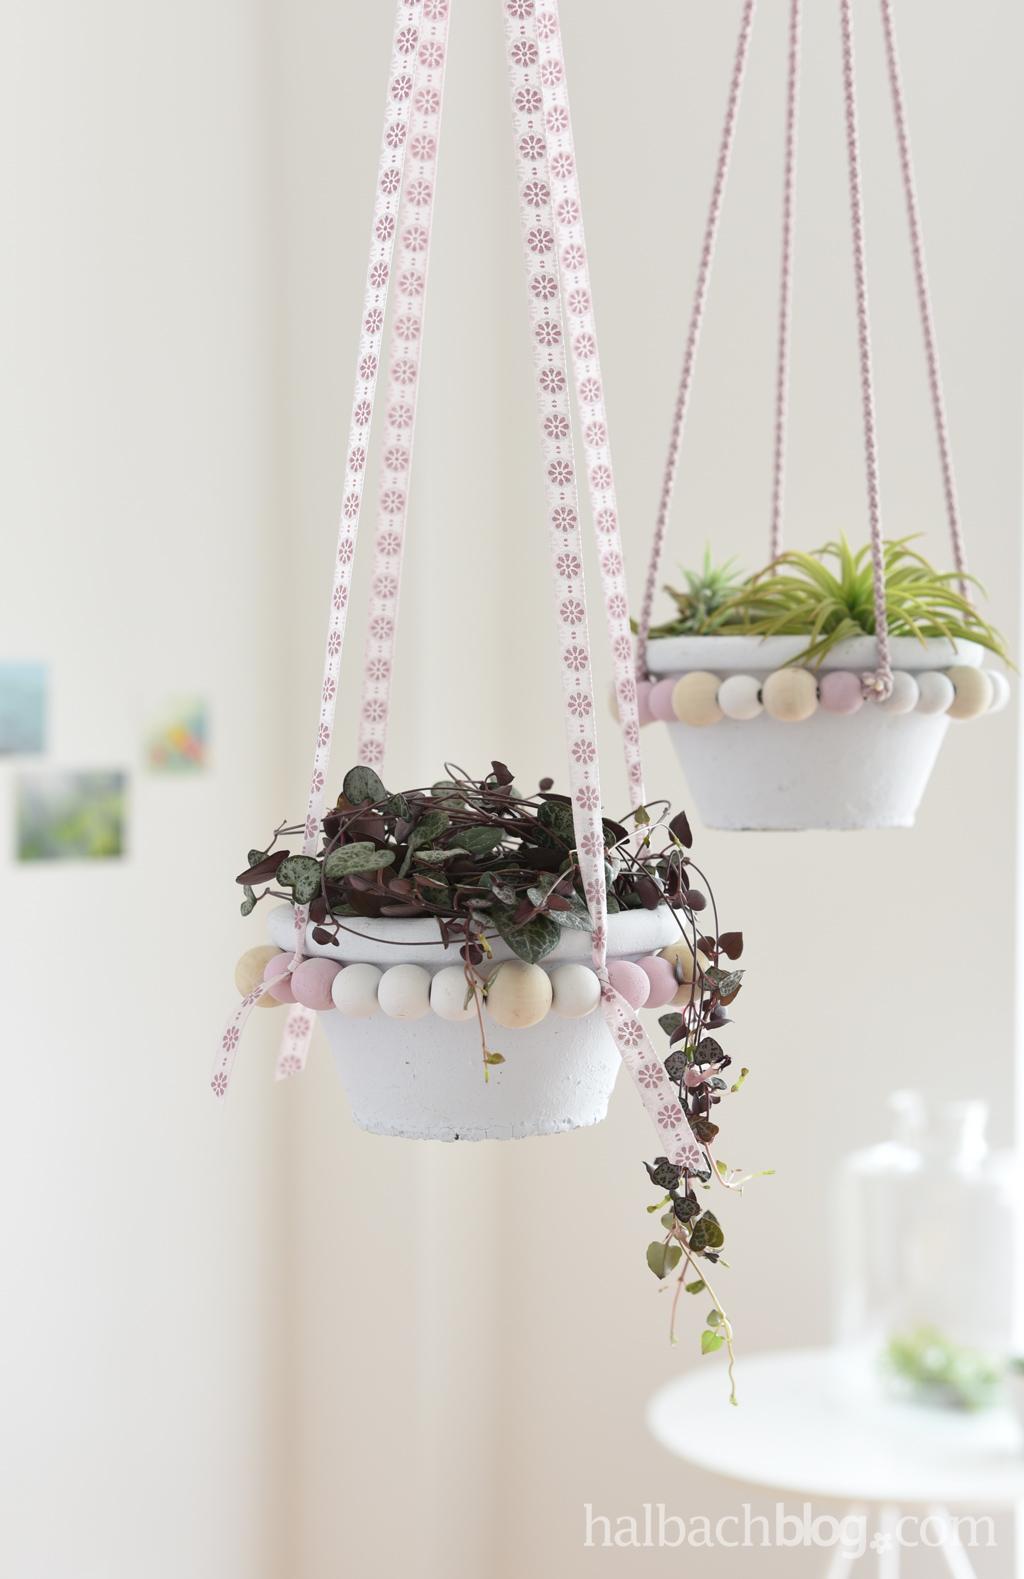 DIY-Blumenampeln aus Holzperlen